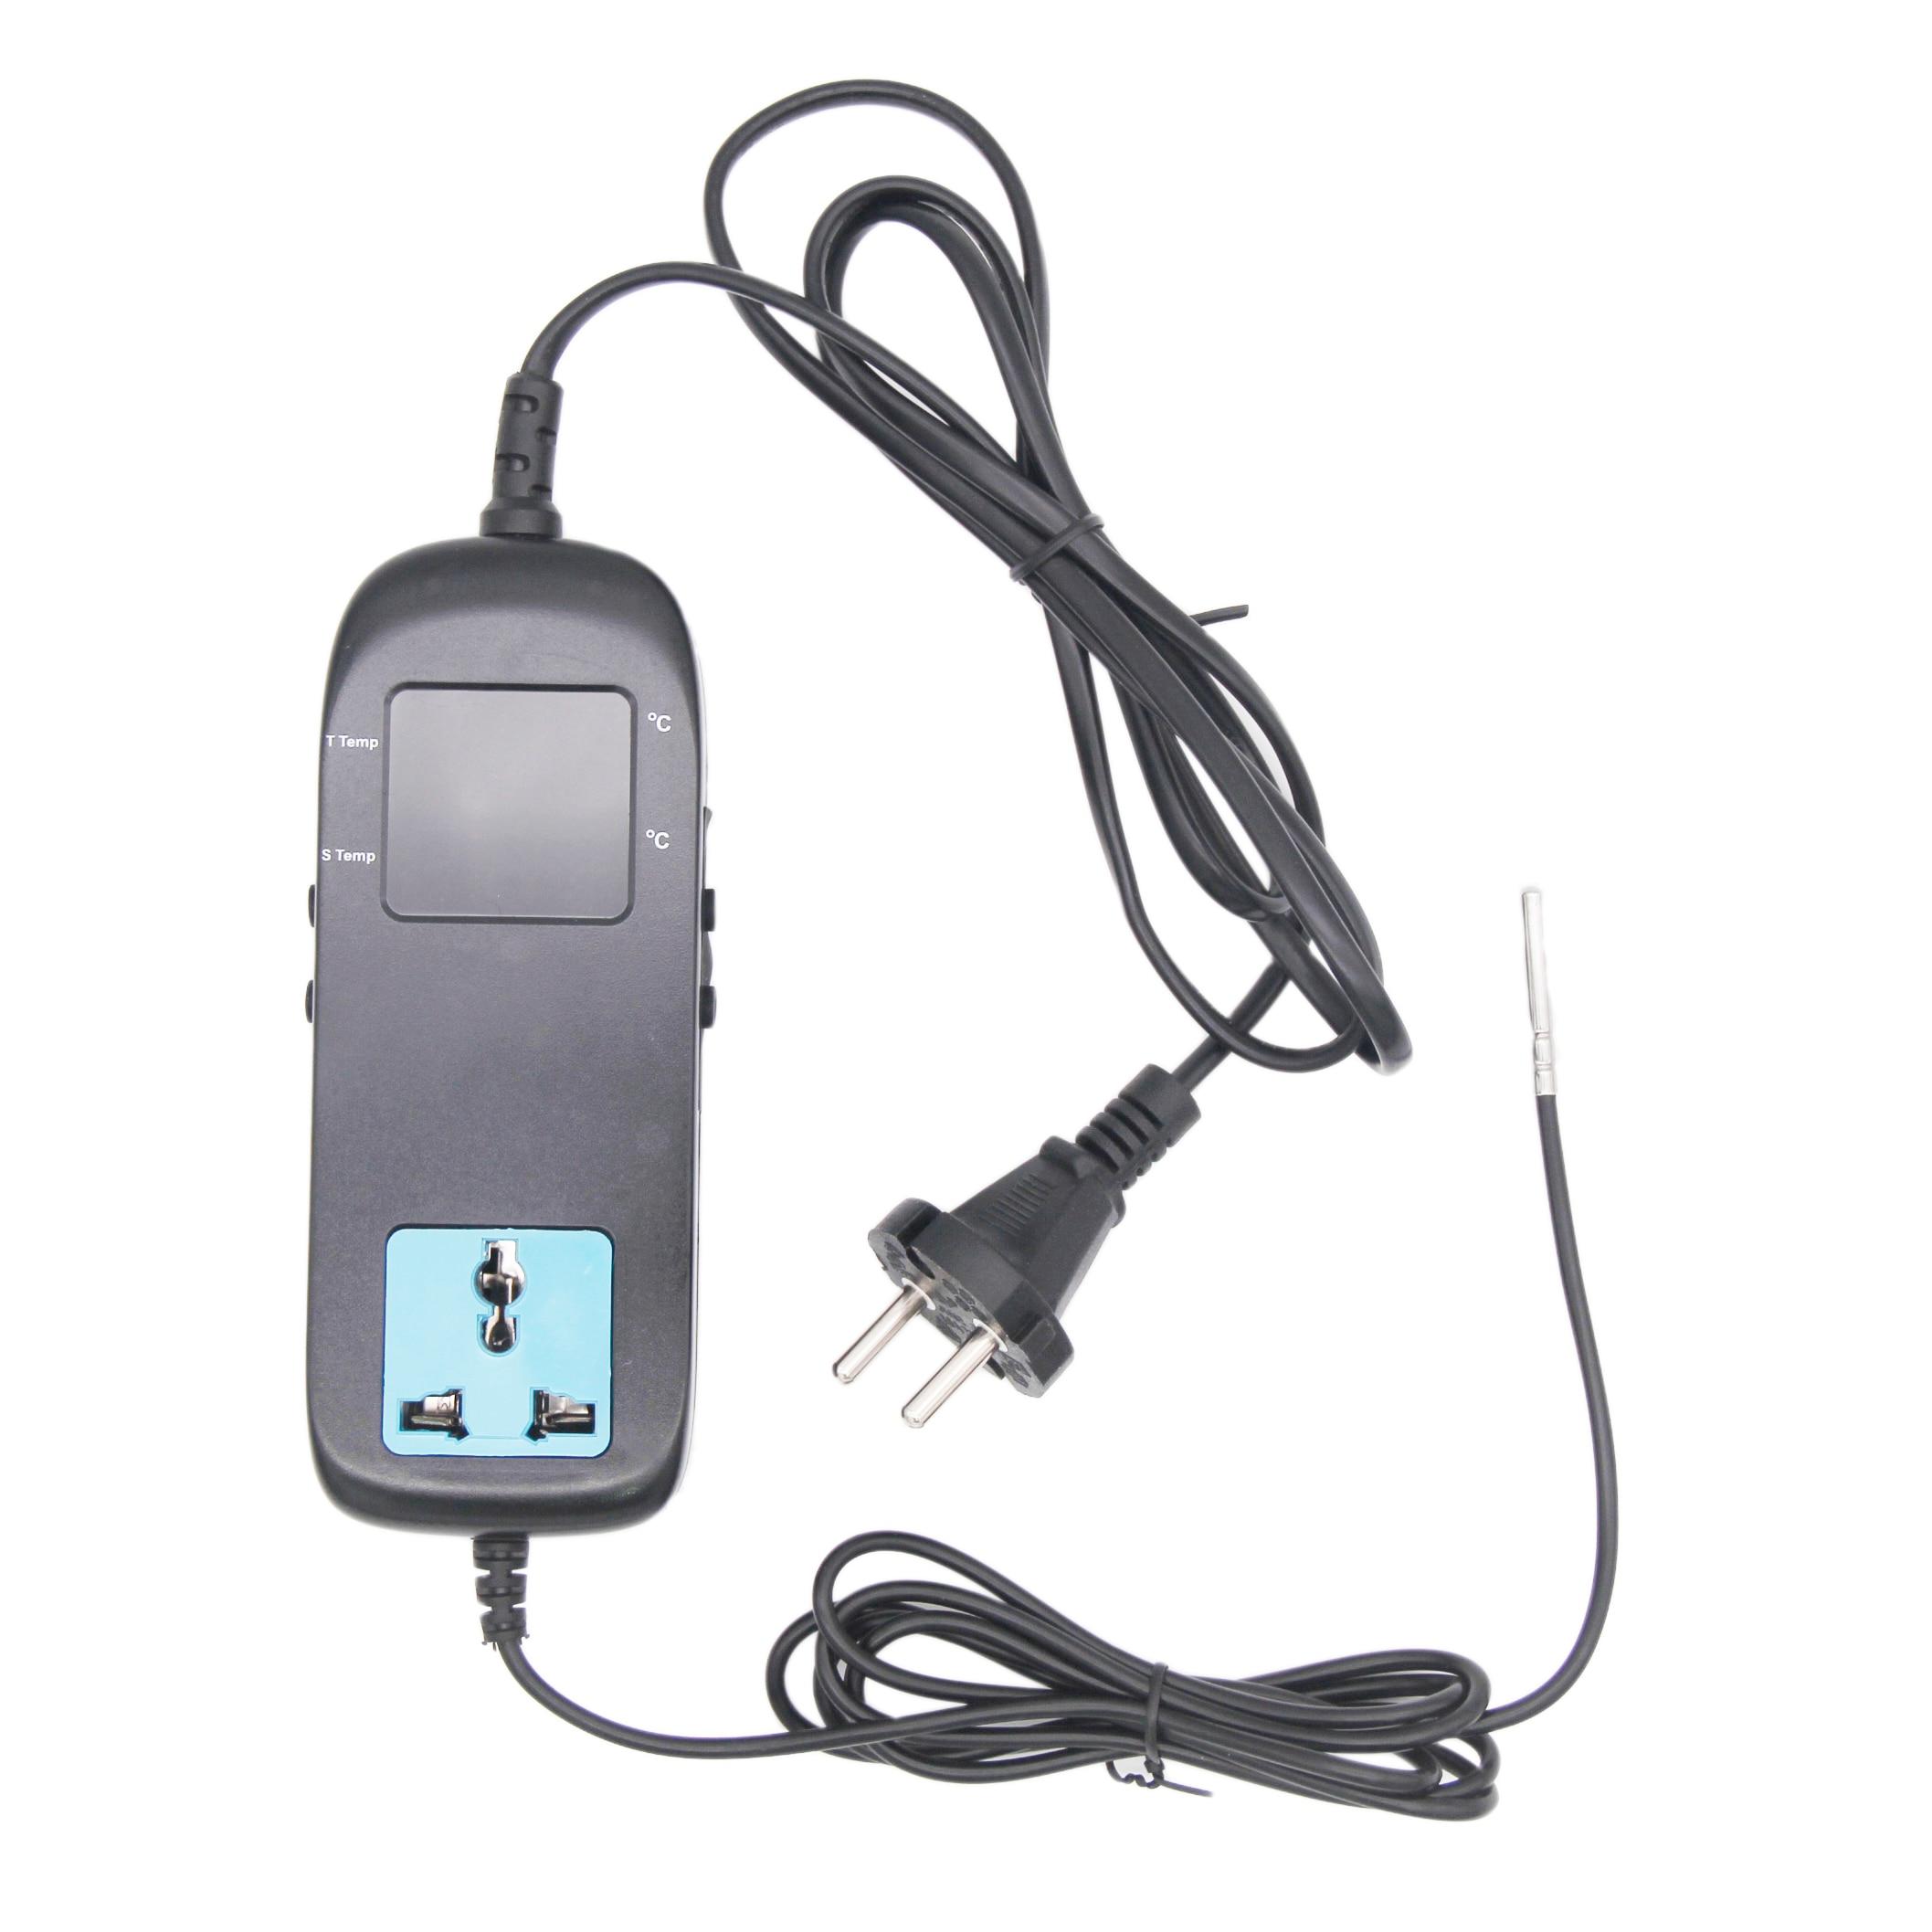 AC90V-250V Heizung und Kühlung Digitale Temperatur Controller Thermostat EU/UL Stecker 3W NTC Sonde